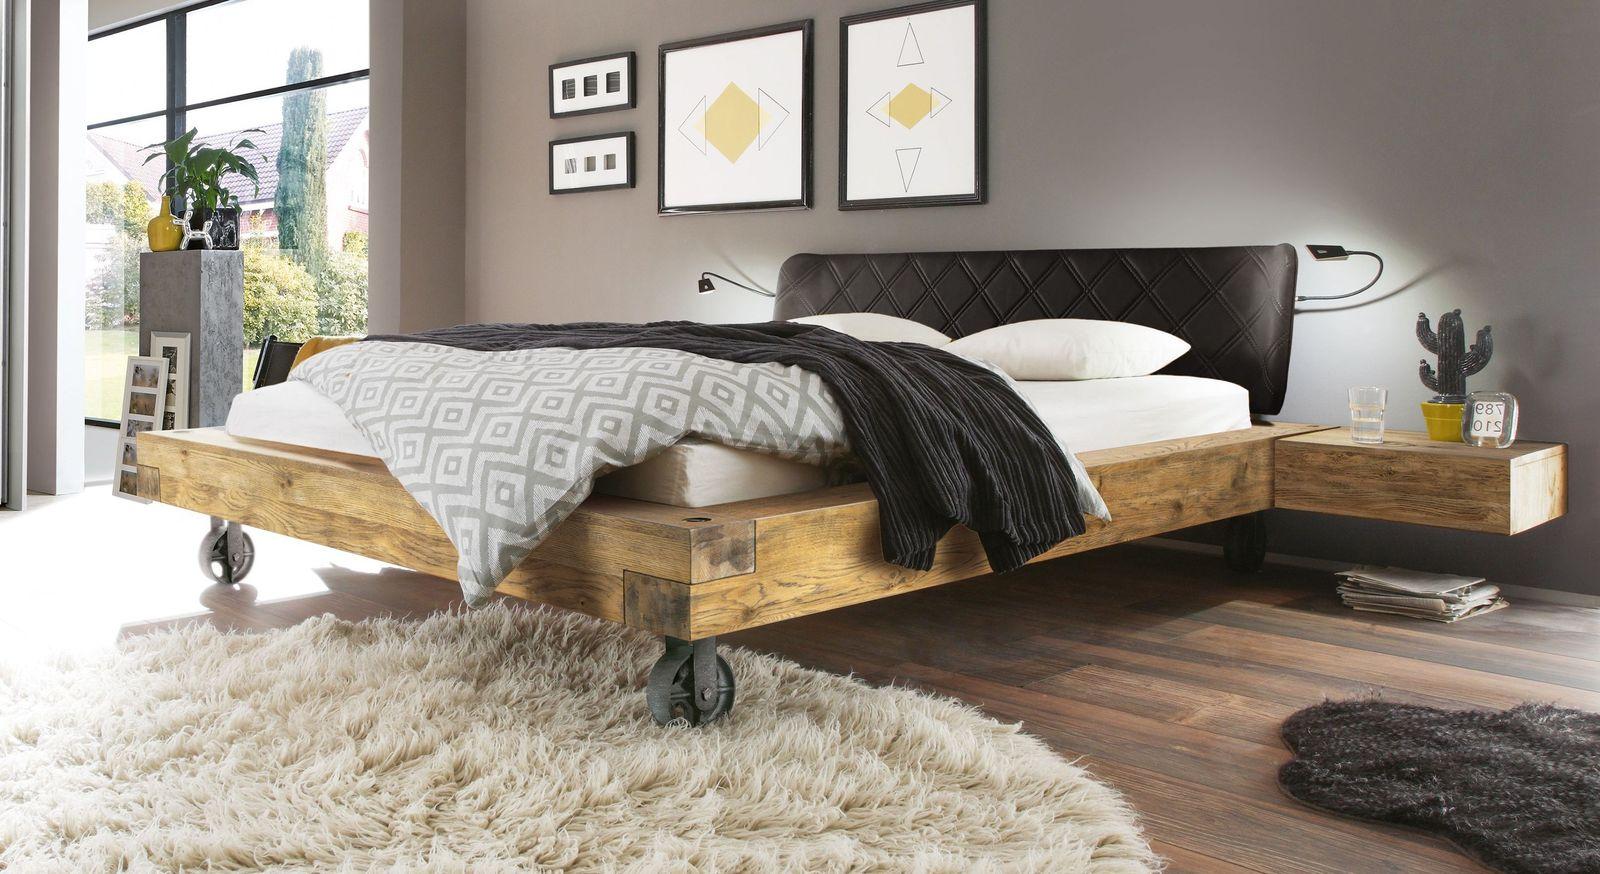 bett industrial style home ideen. Black Bedroom Furniture Sets. Home Design Ideas